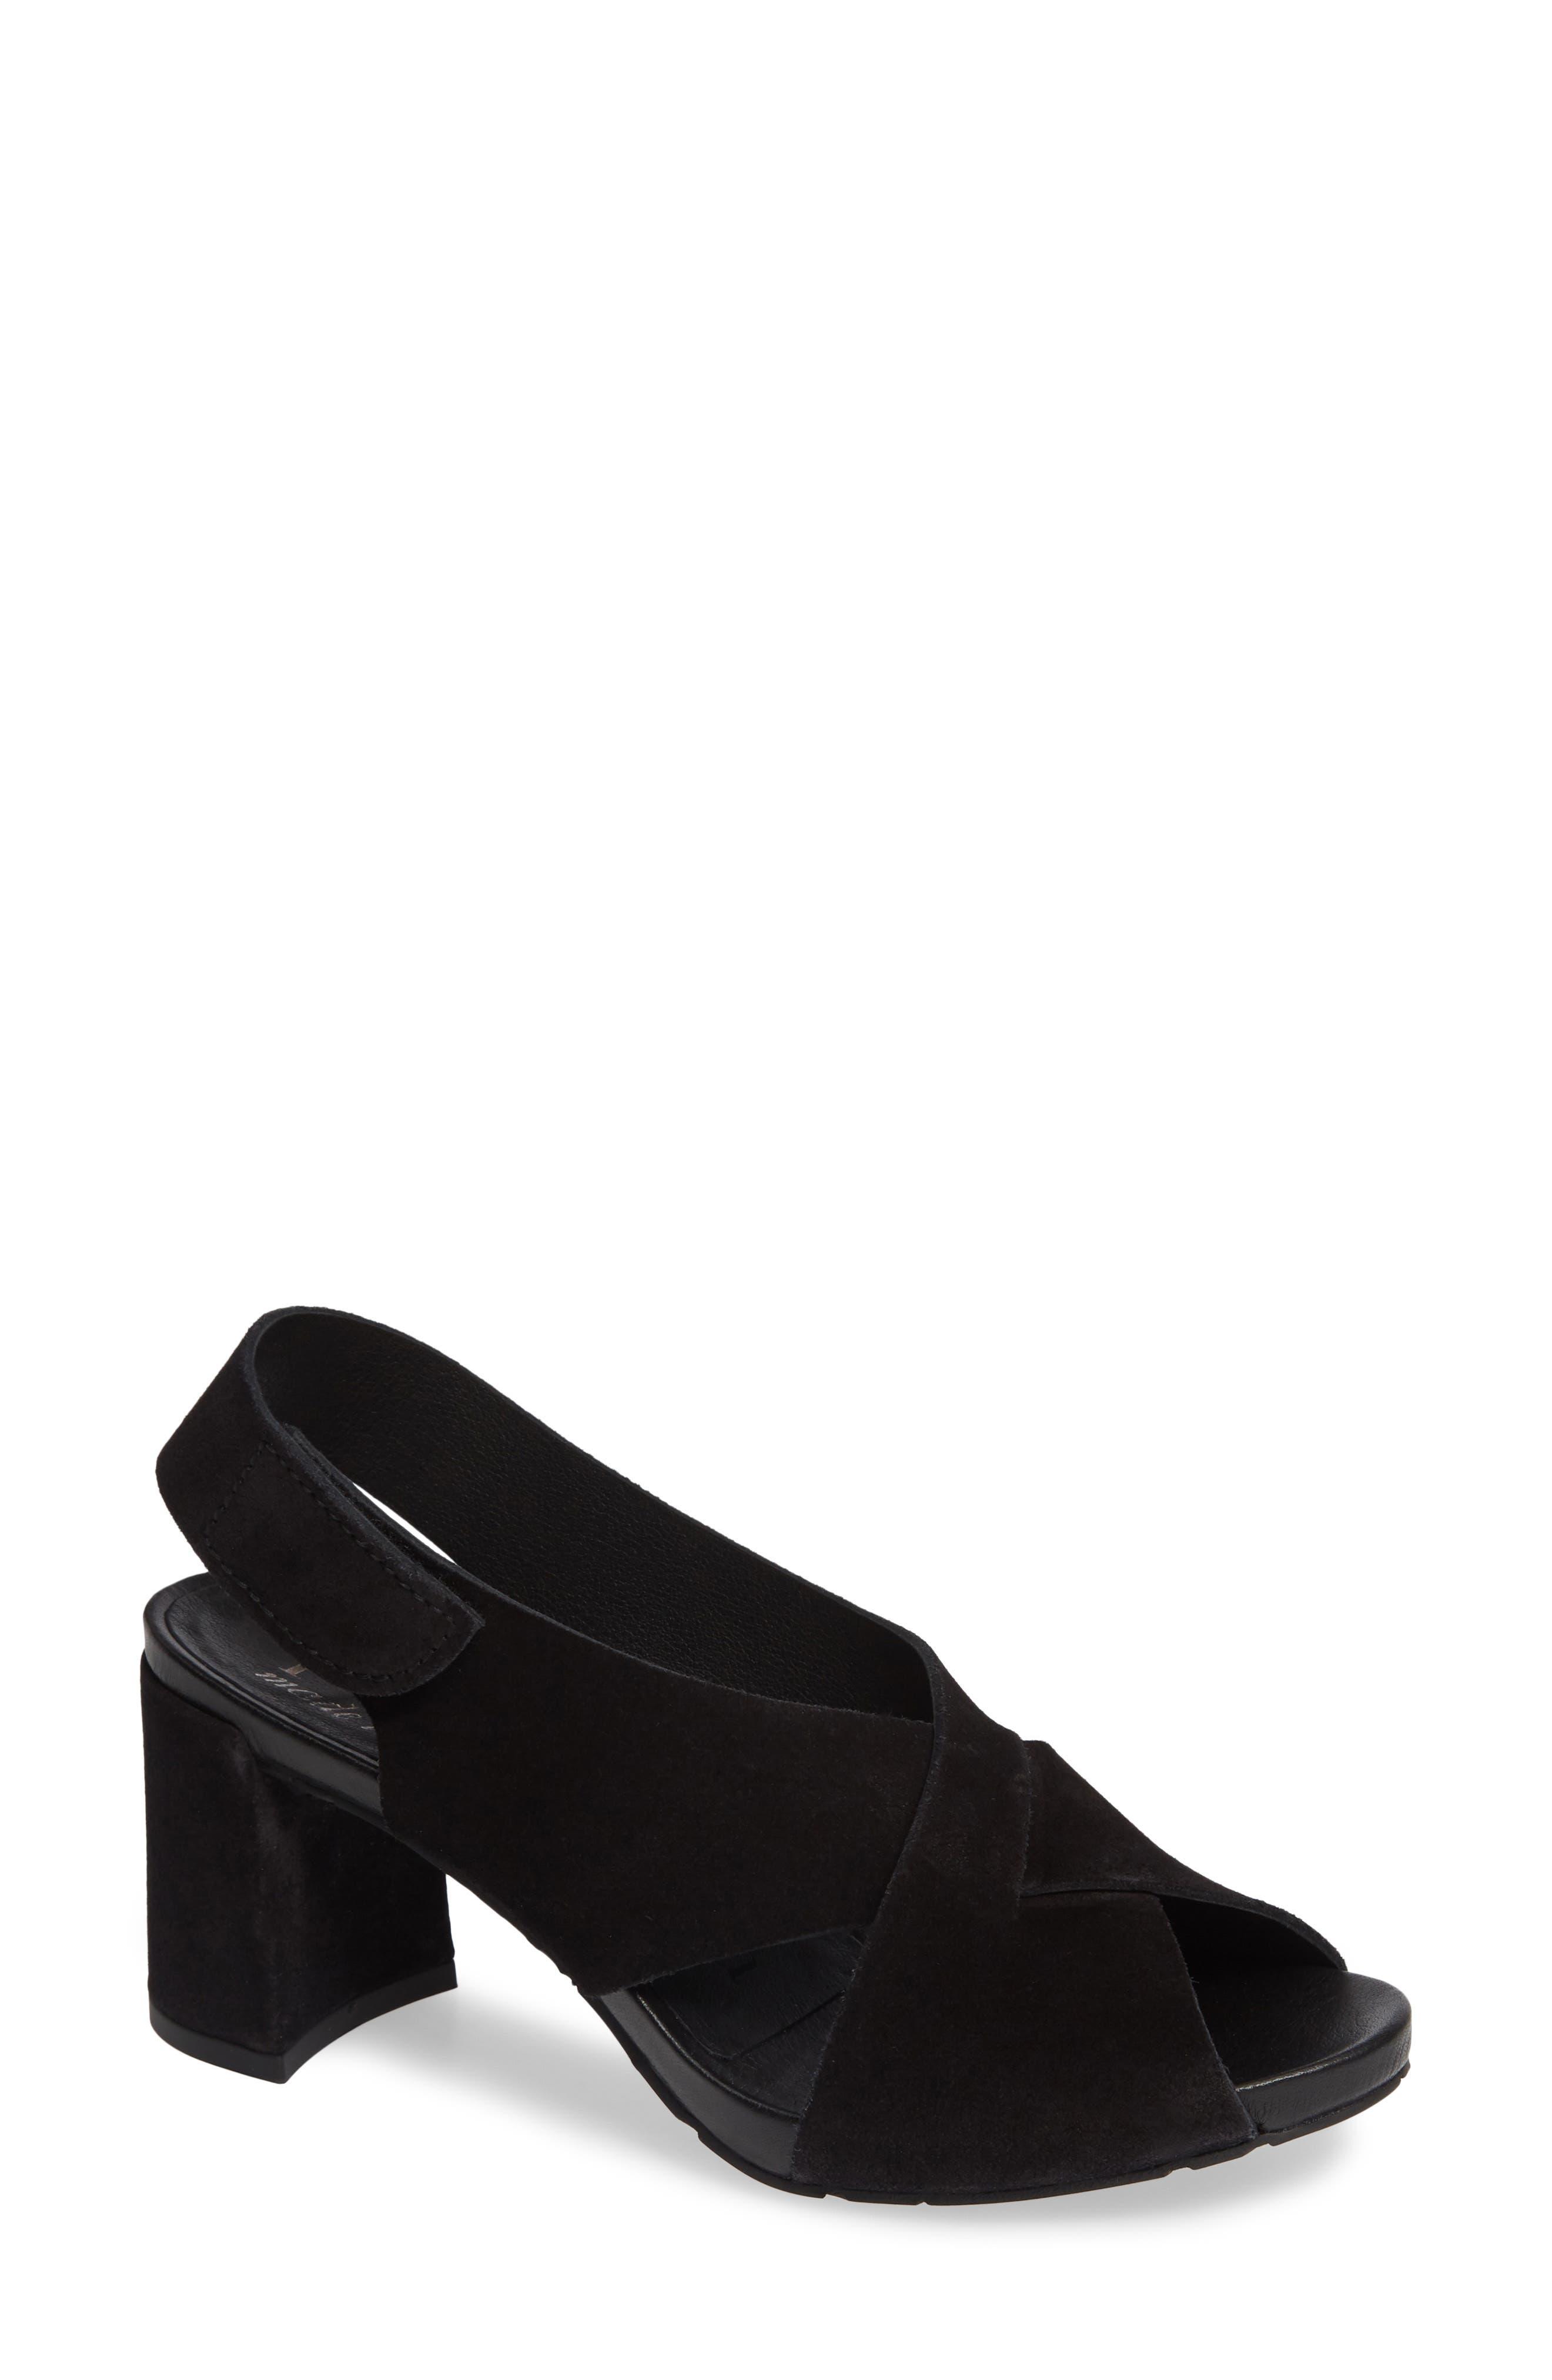 PEDRO GARCIA, Wiela Slingback Sandal, Main thumbnail 1, color, BLACK CASTORO